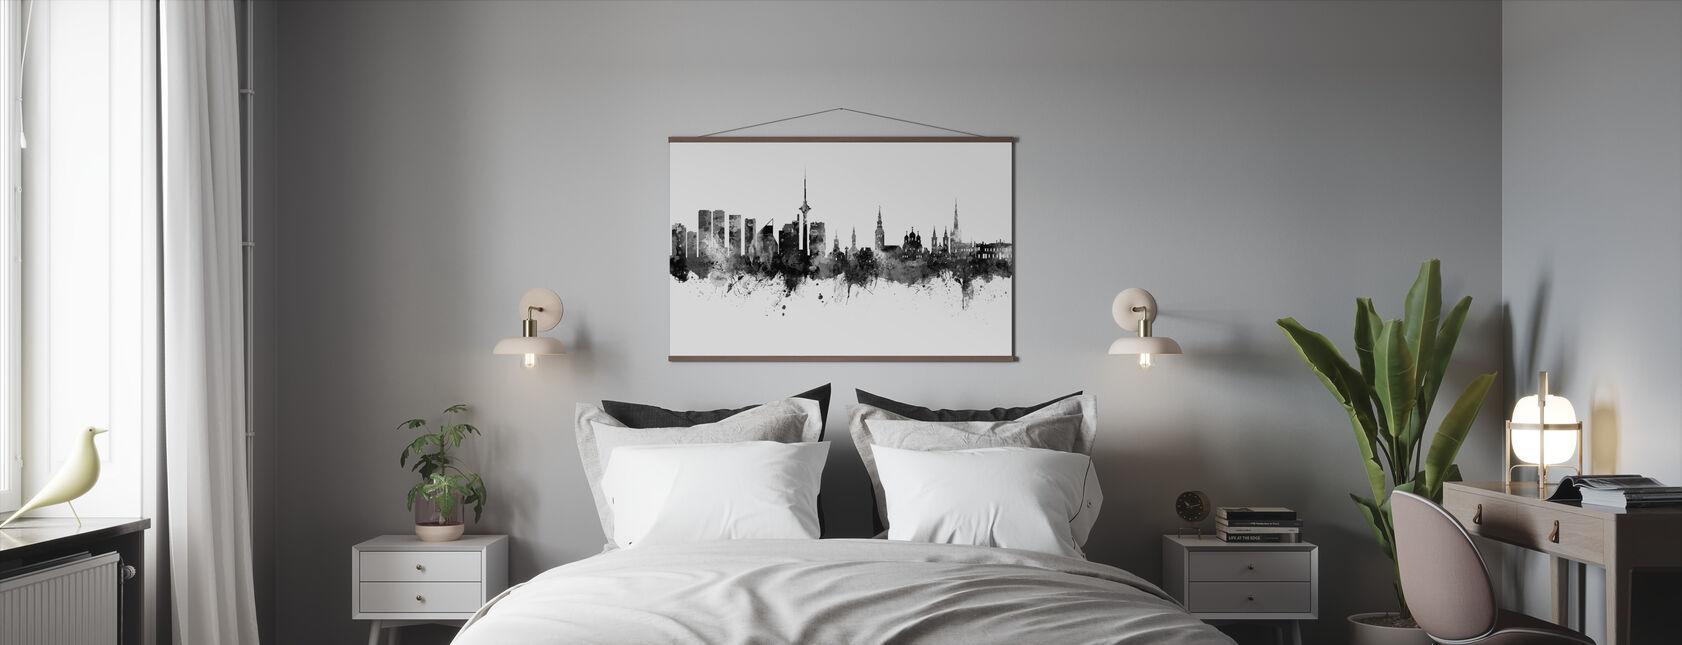 Tallinn Estonia Skyline - Poster - Bedroom